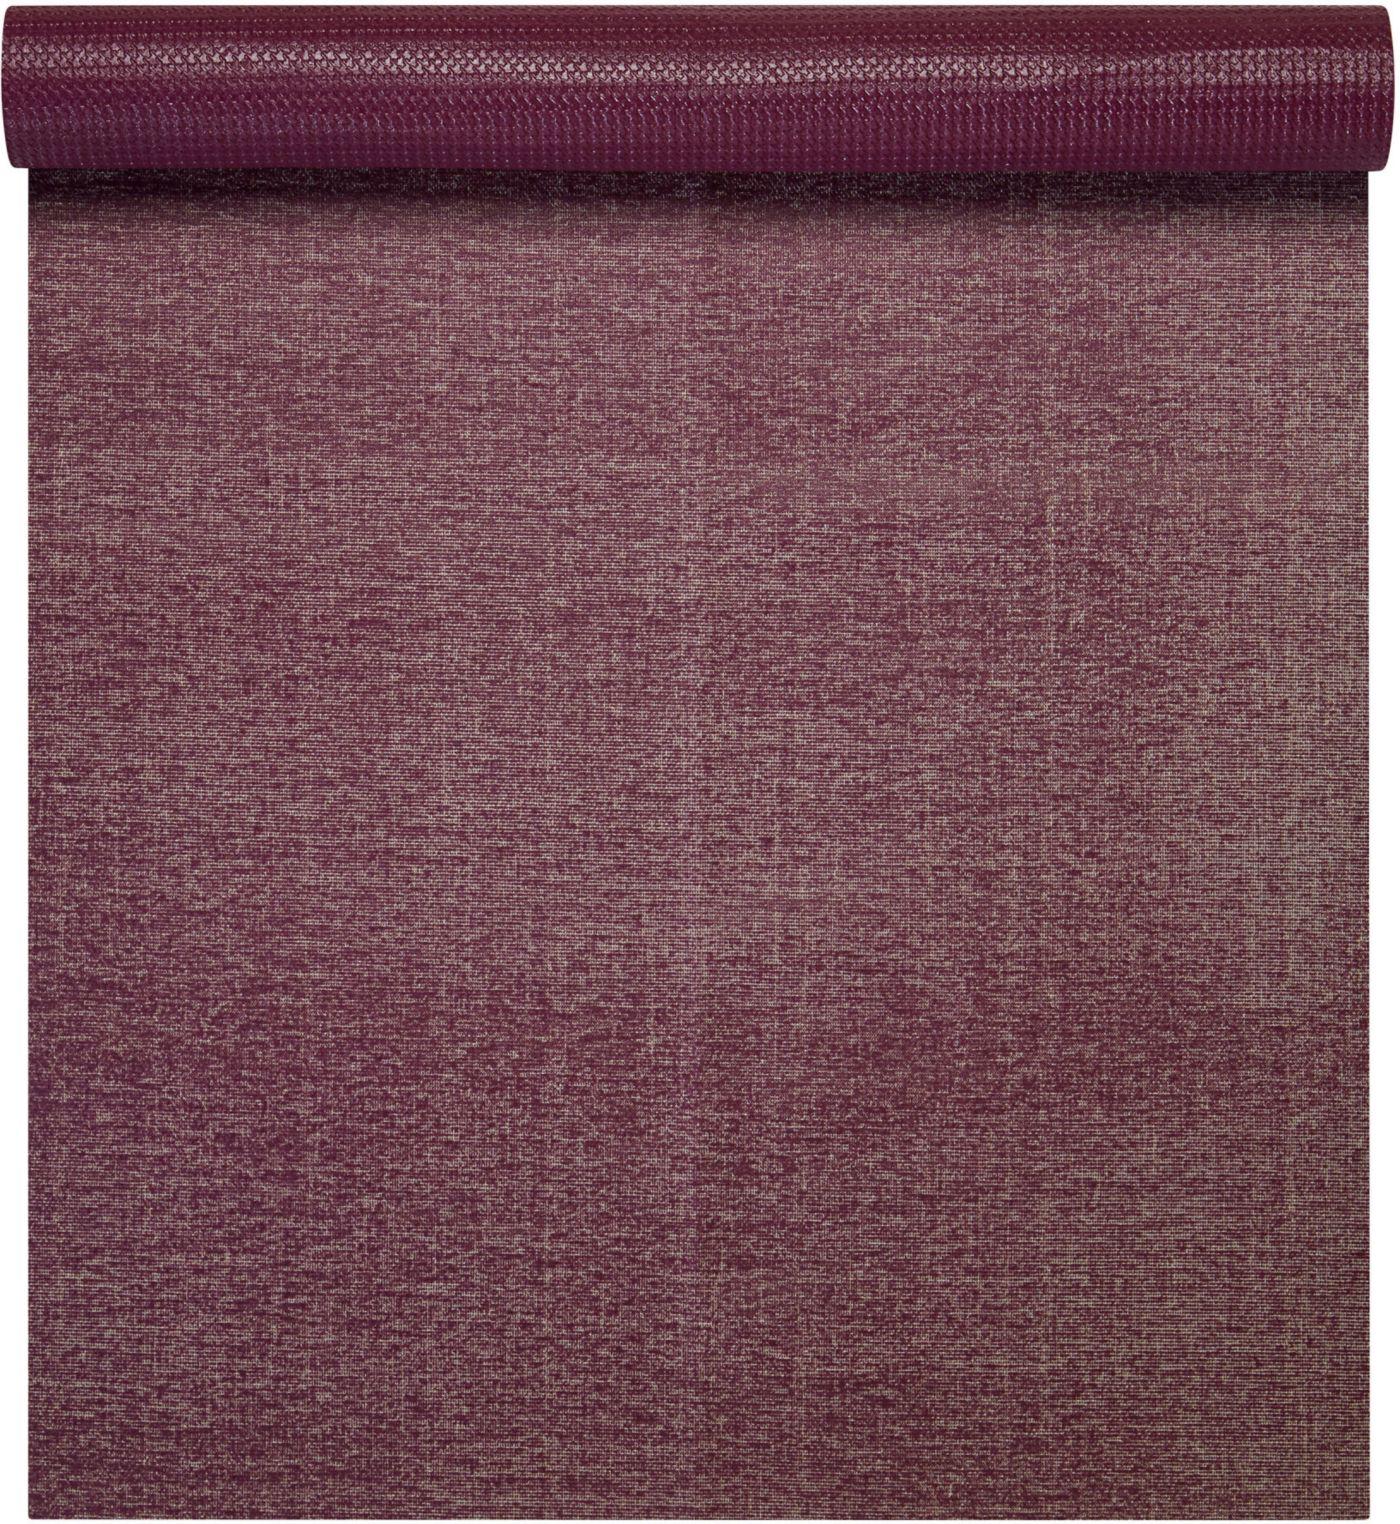 Gaiam Studio Select On-The-Go Yoga Mat